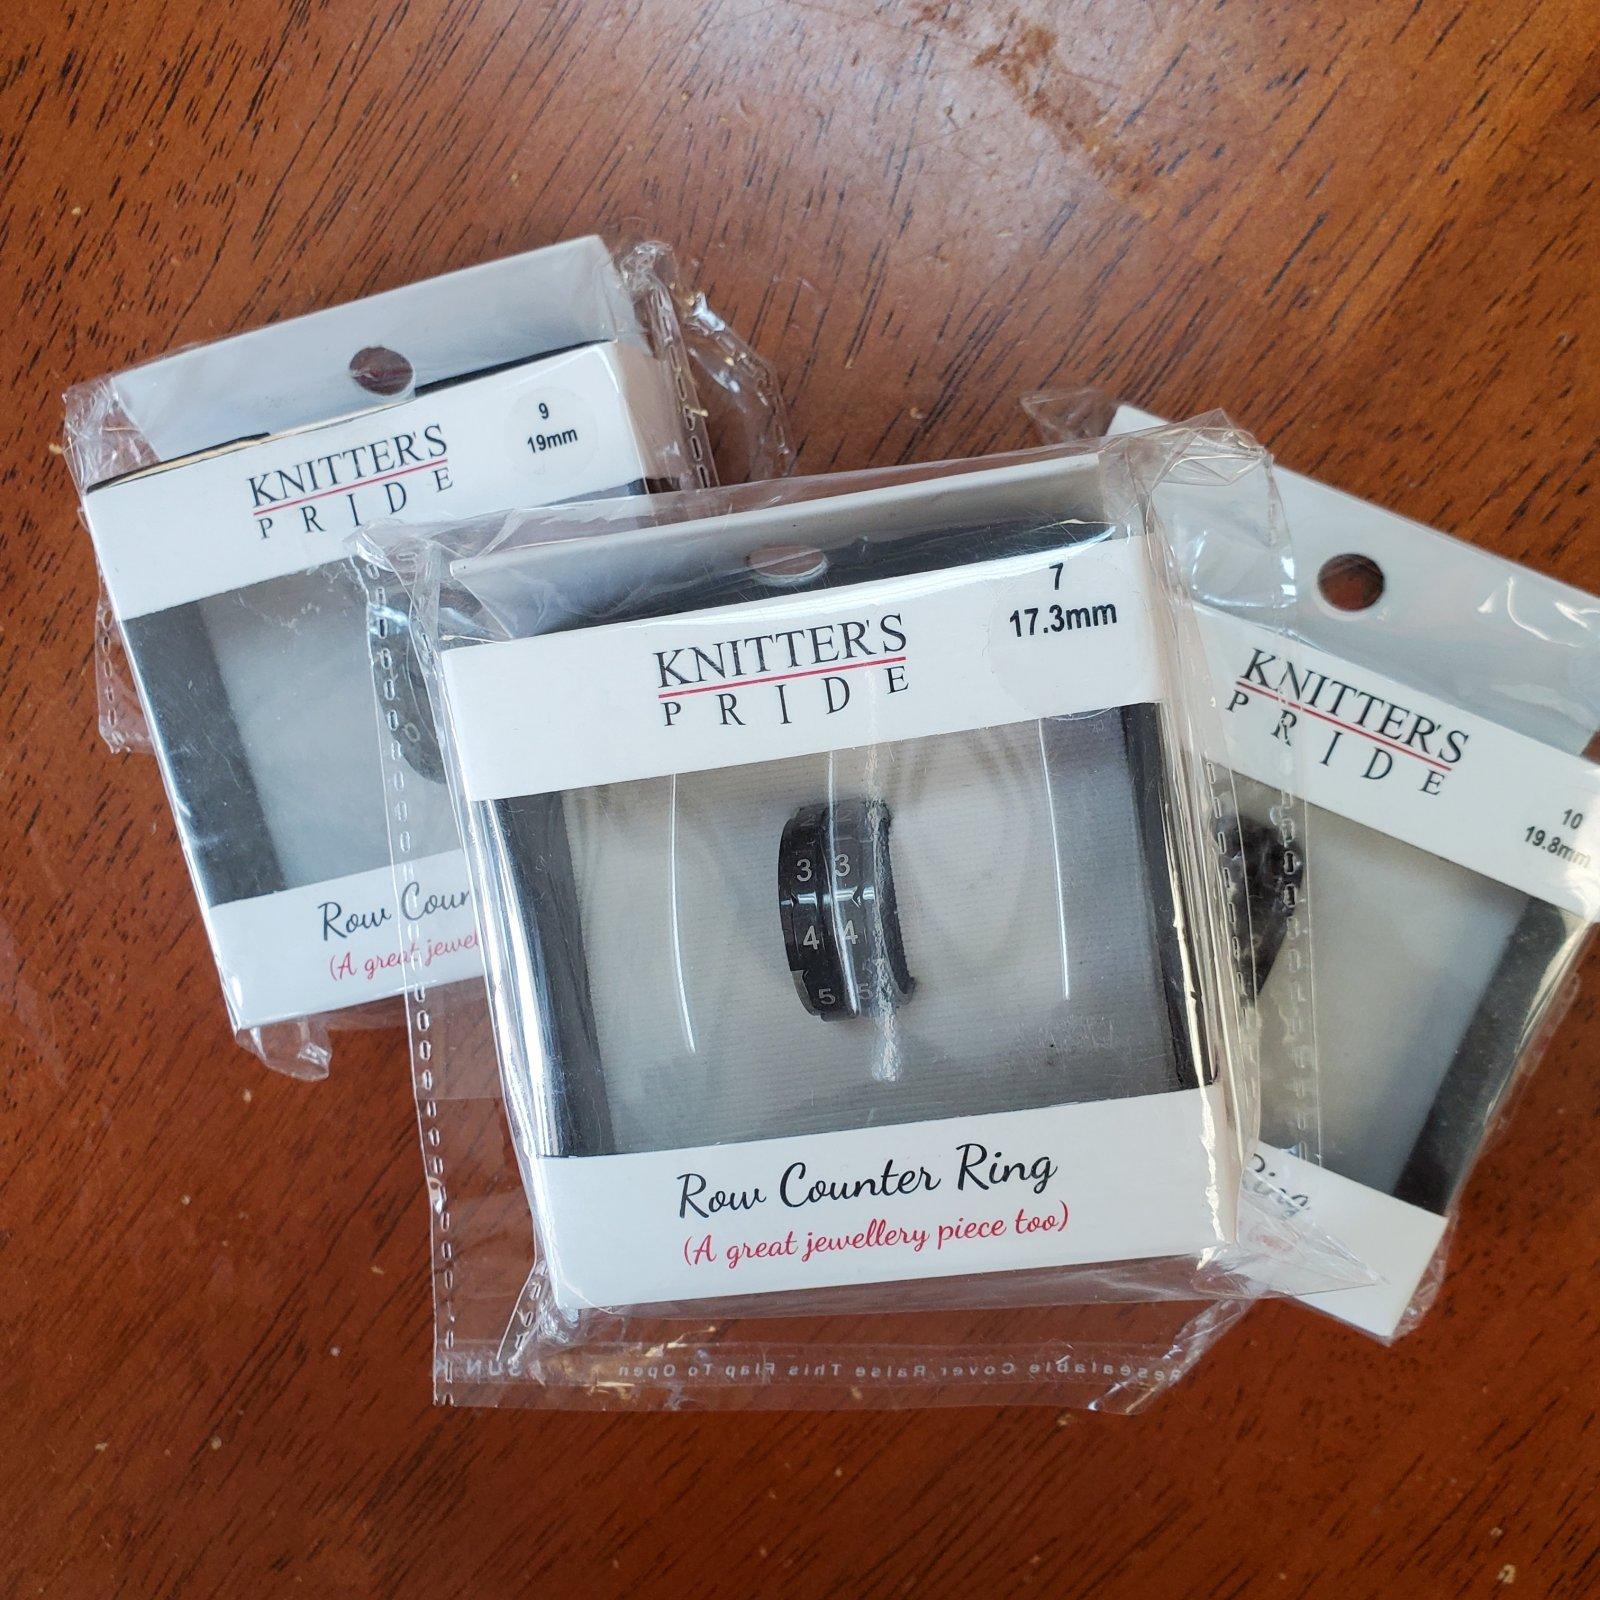 Row Counter Rings Black / Knitter's Pride